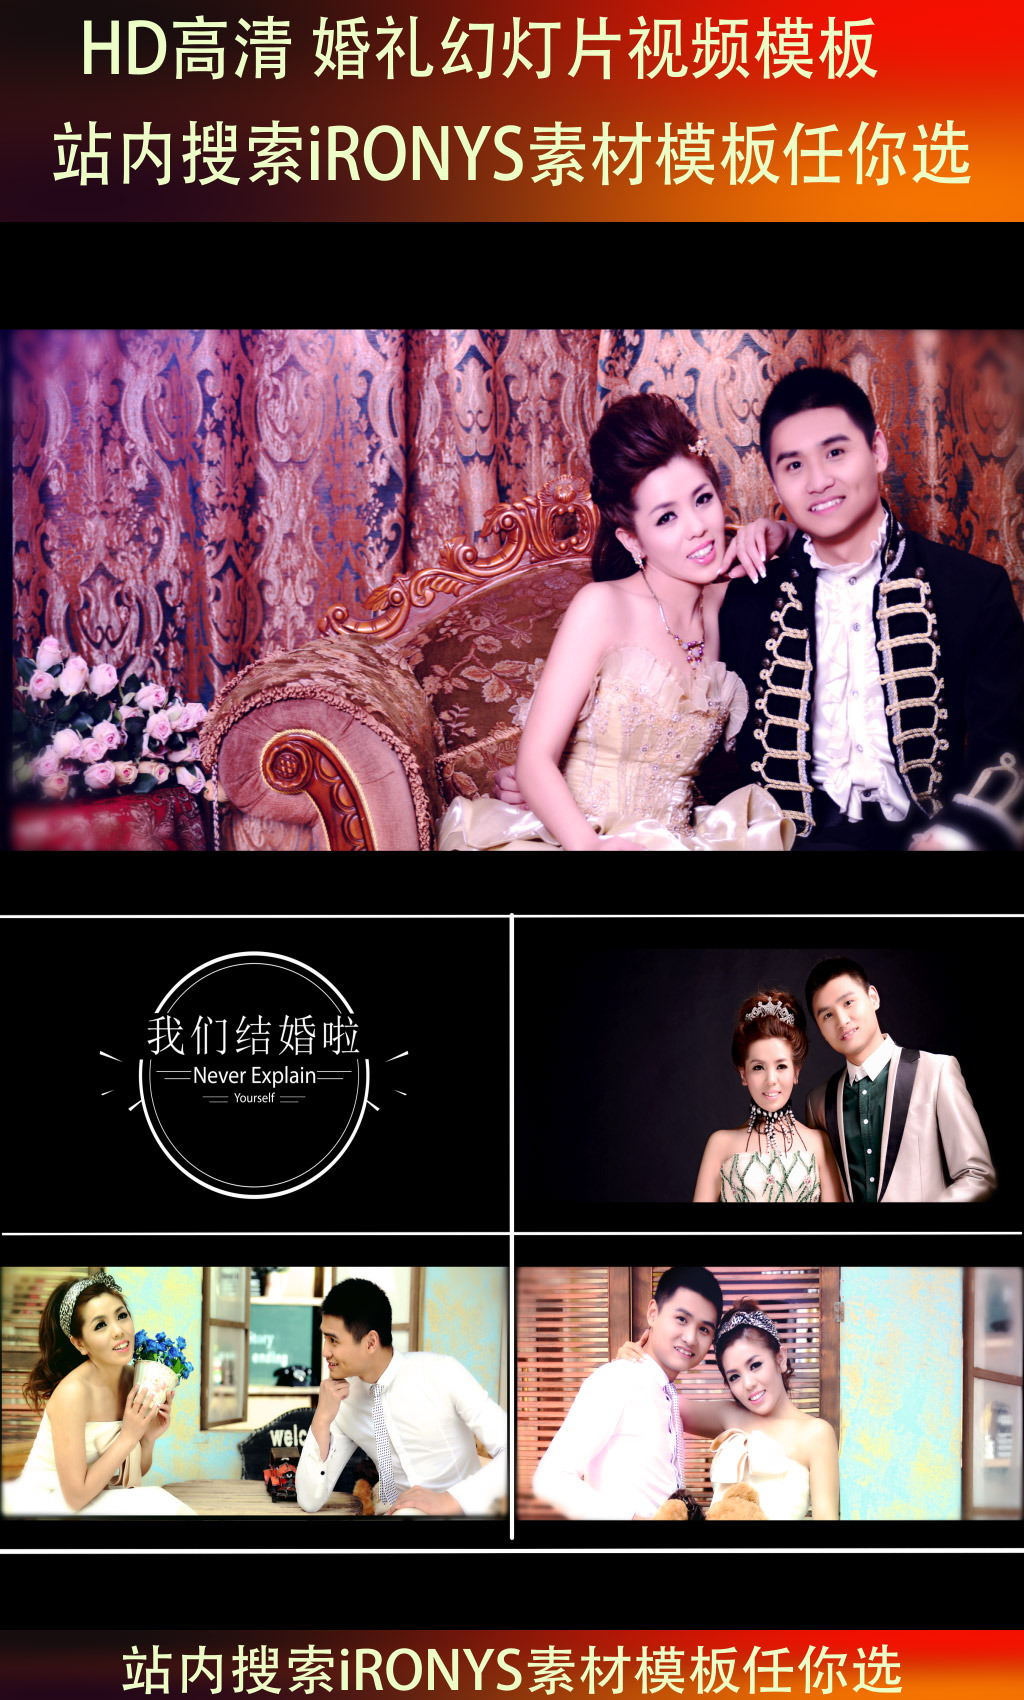 ae婚礼相册幻灯片视频模板下载(图片编号:12269104)